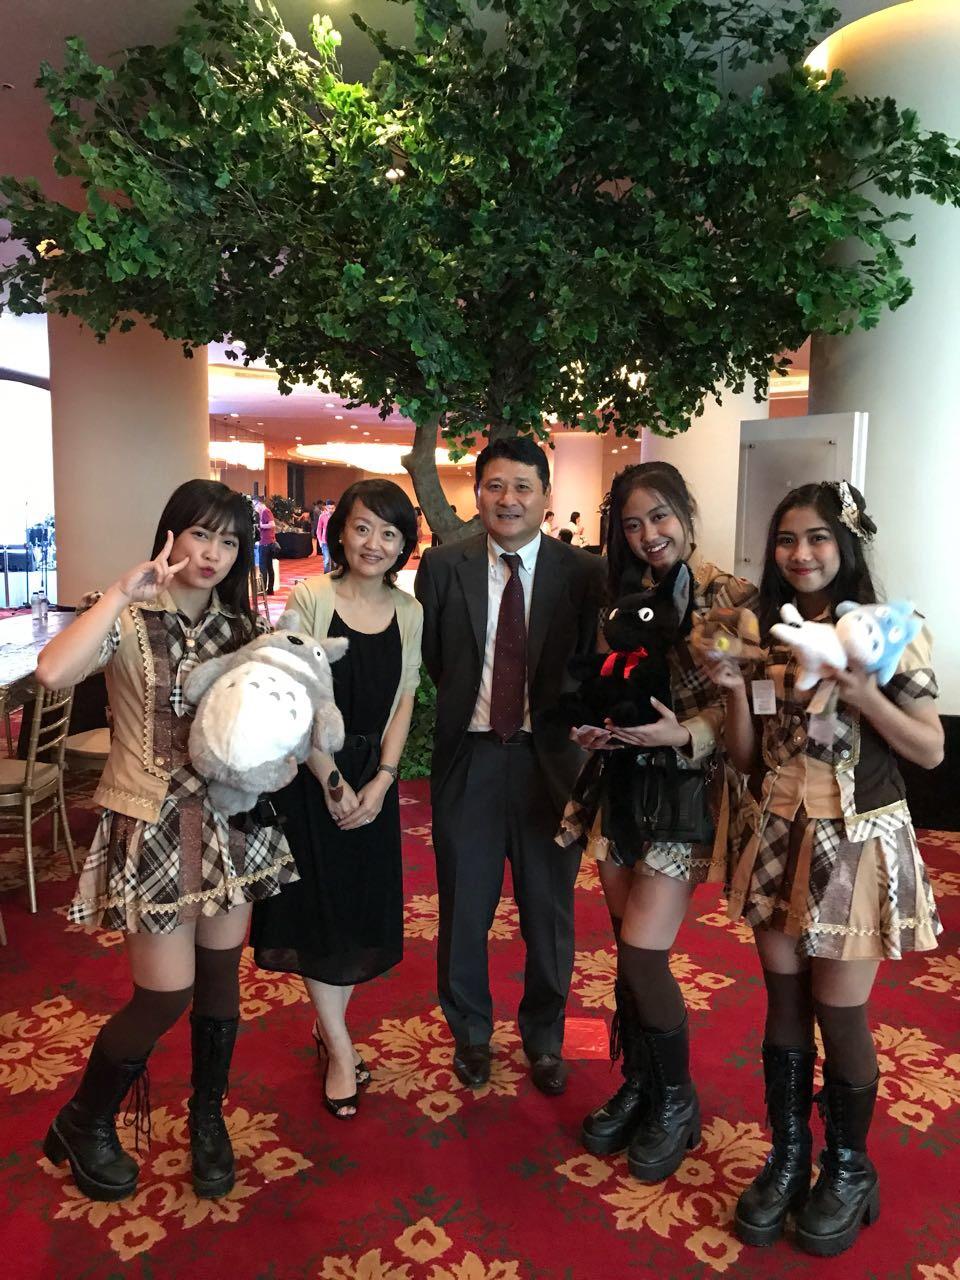 Mr. Akinobu Mizumoto (Finance Director) with JKT48 Acoustic members